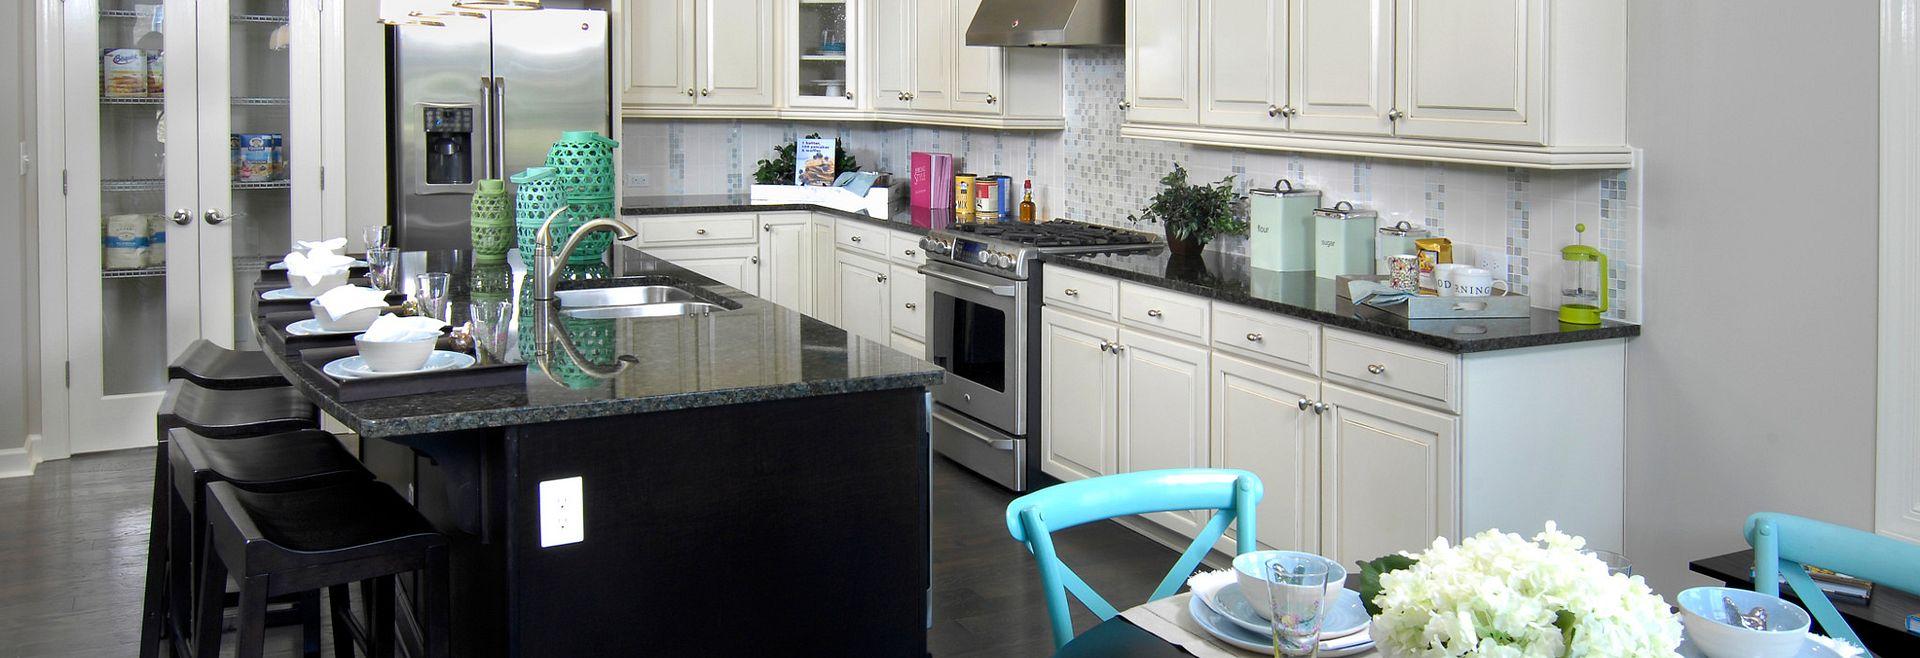 Silverado plan Kitchen